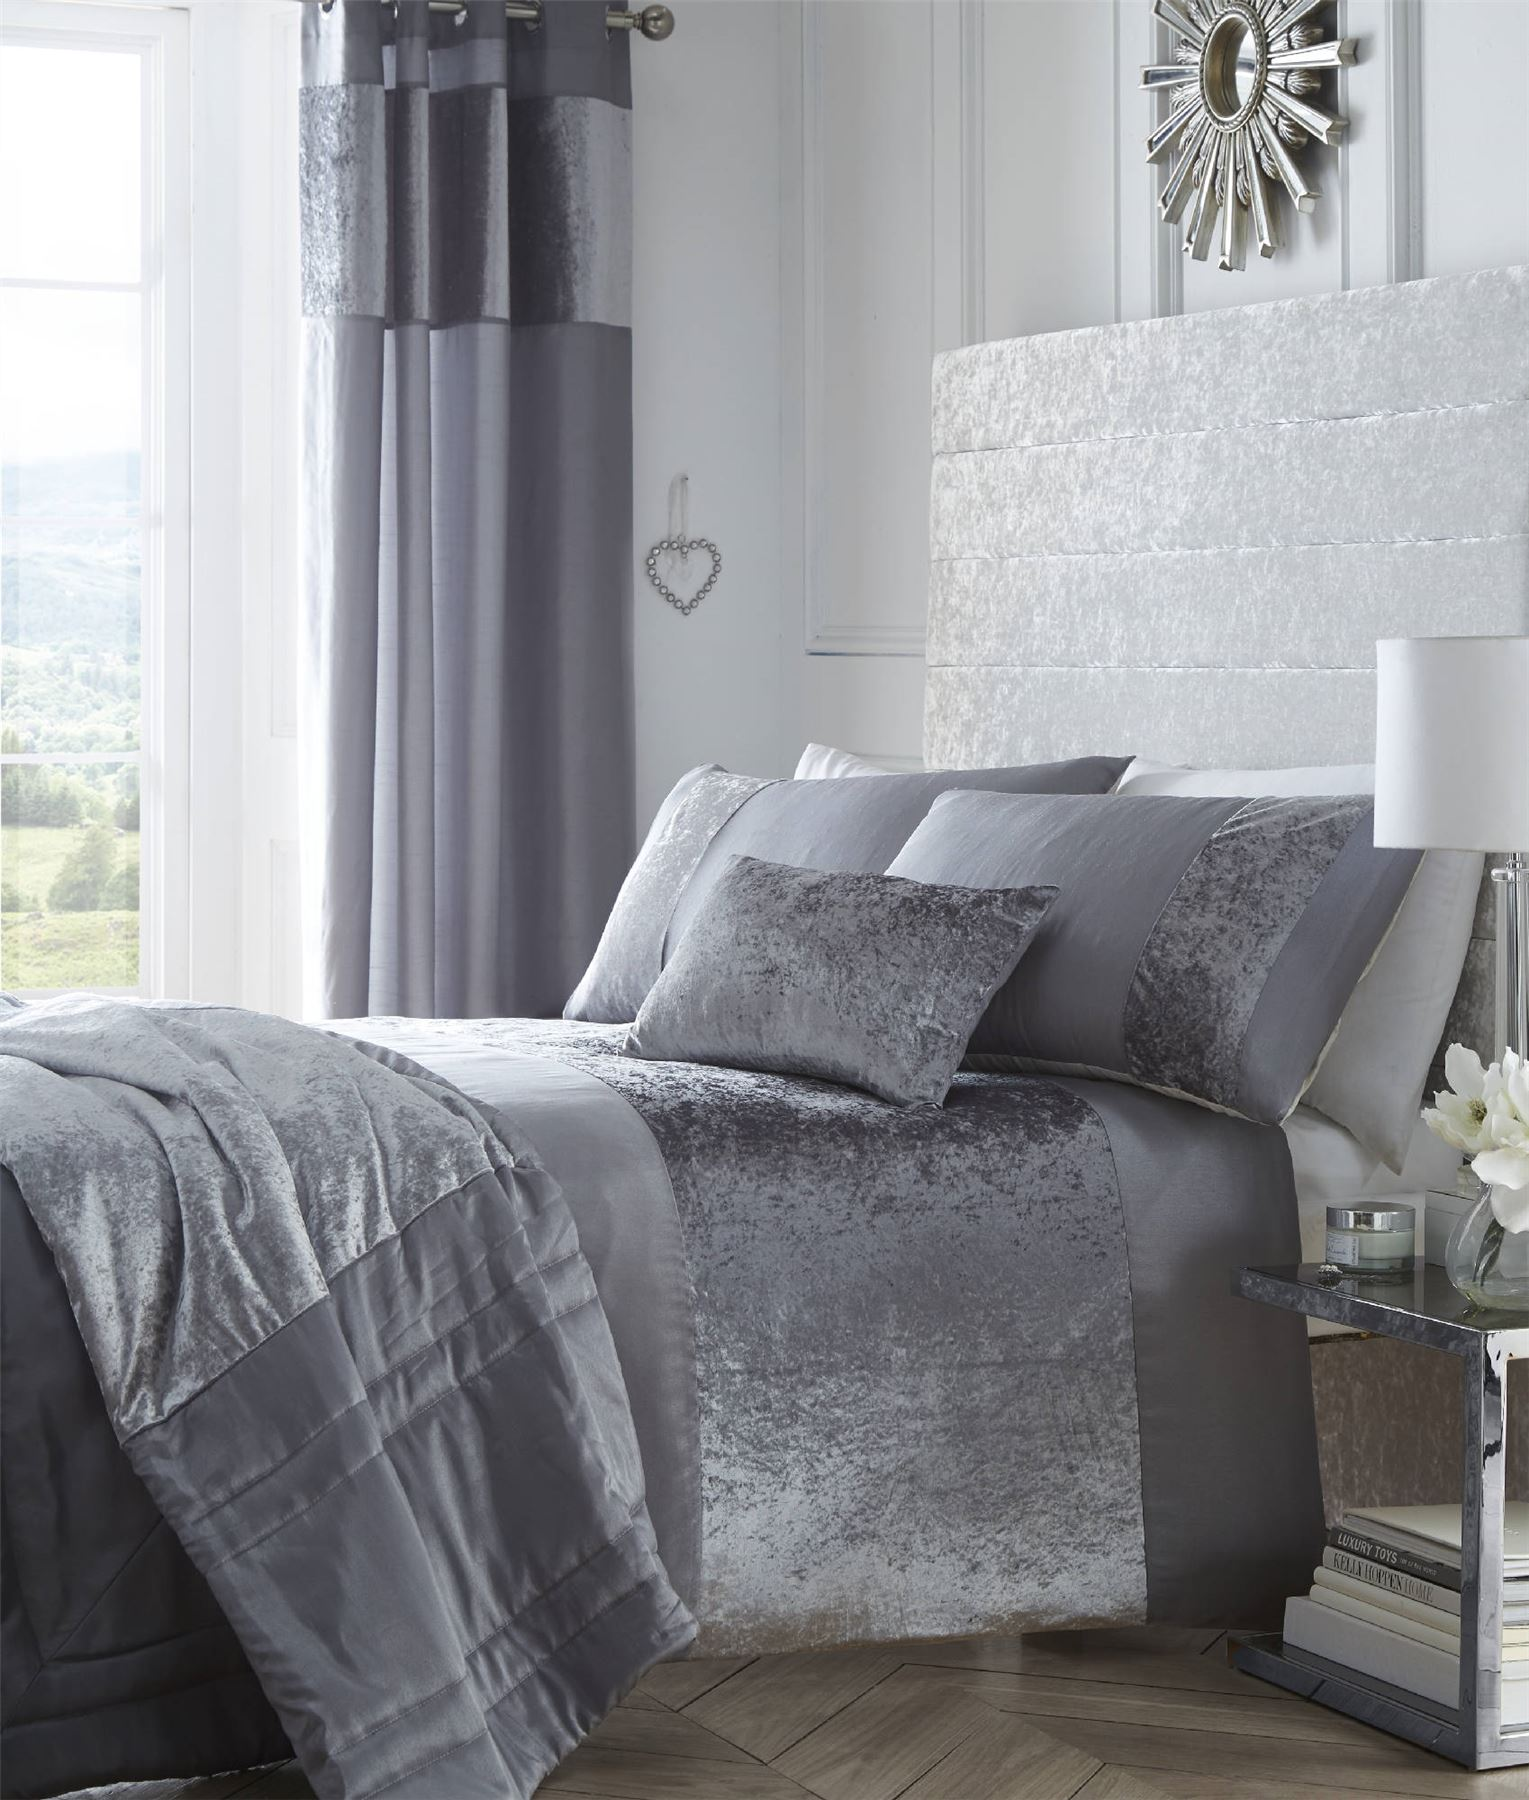 grey crushed velvet chair covers cover ideas luxury panel duvet bedding set